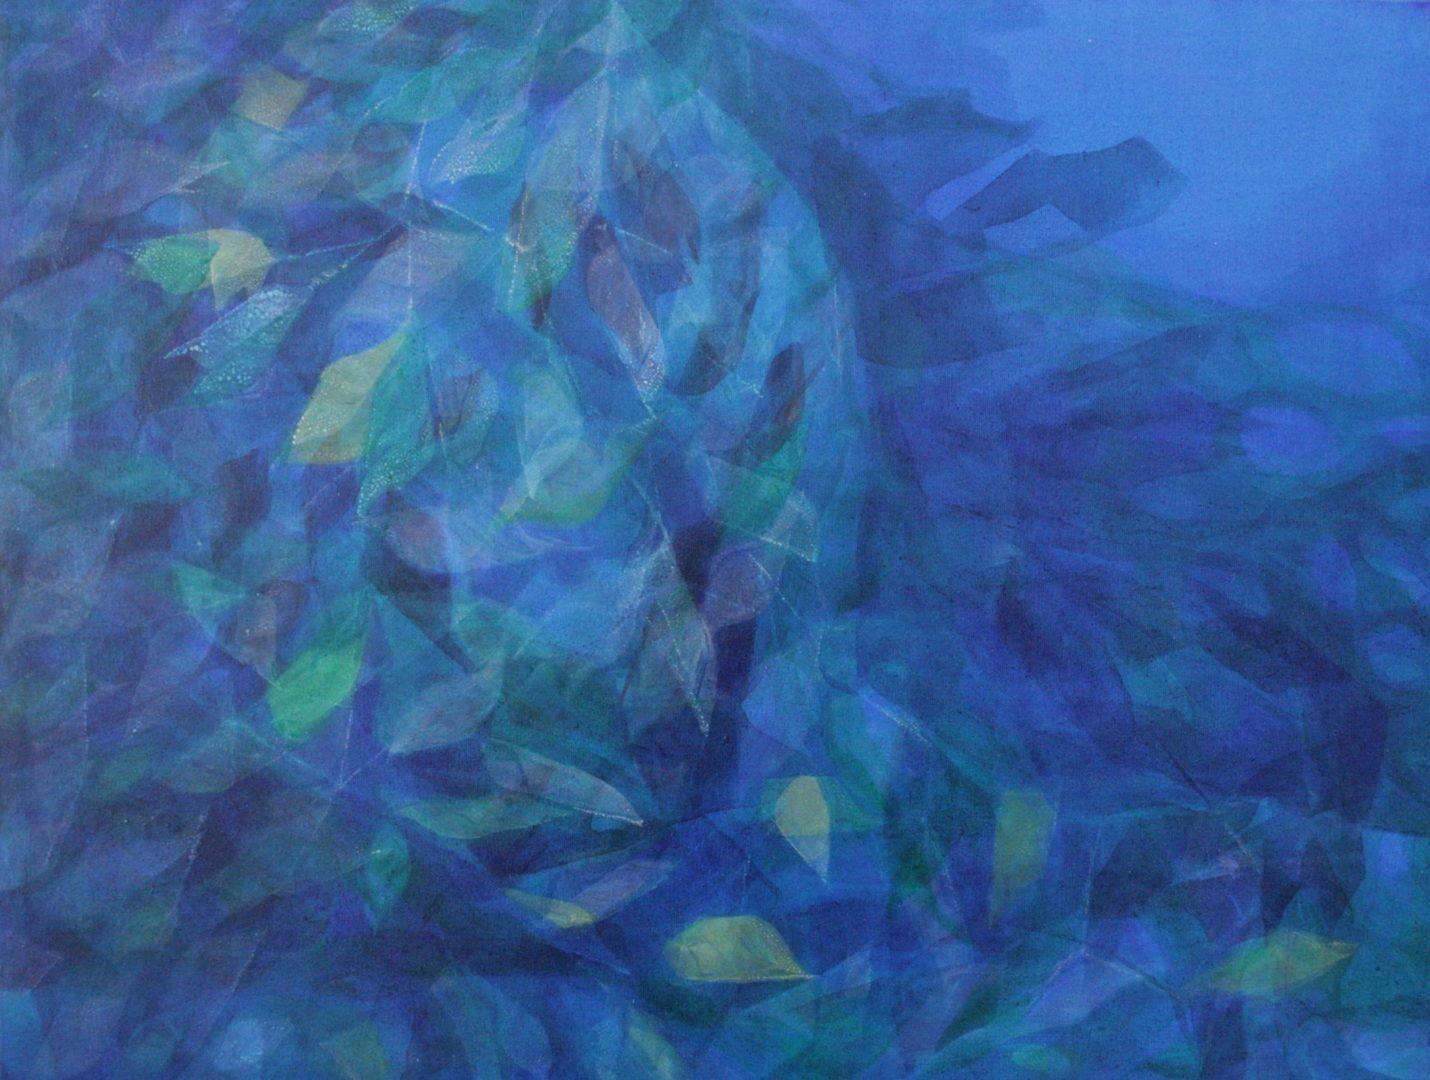 Aquis submersus V - Acryl Lasur auf Leinwand, 60 x 80 cm, 2009 ©Ursula Heermann-Jensen